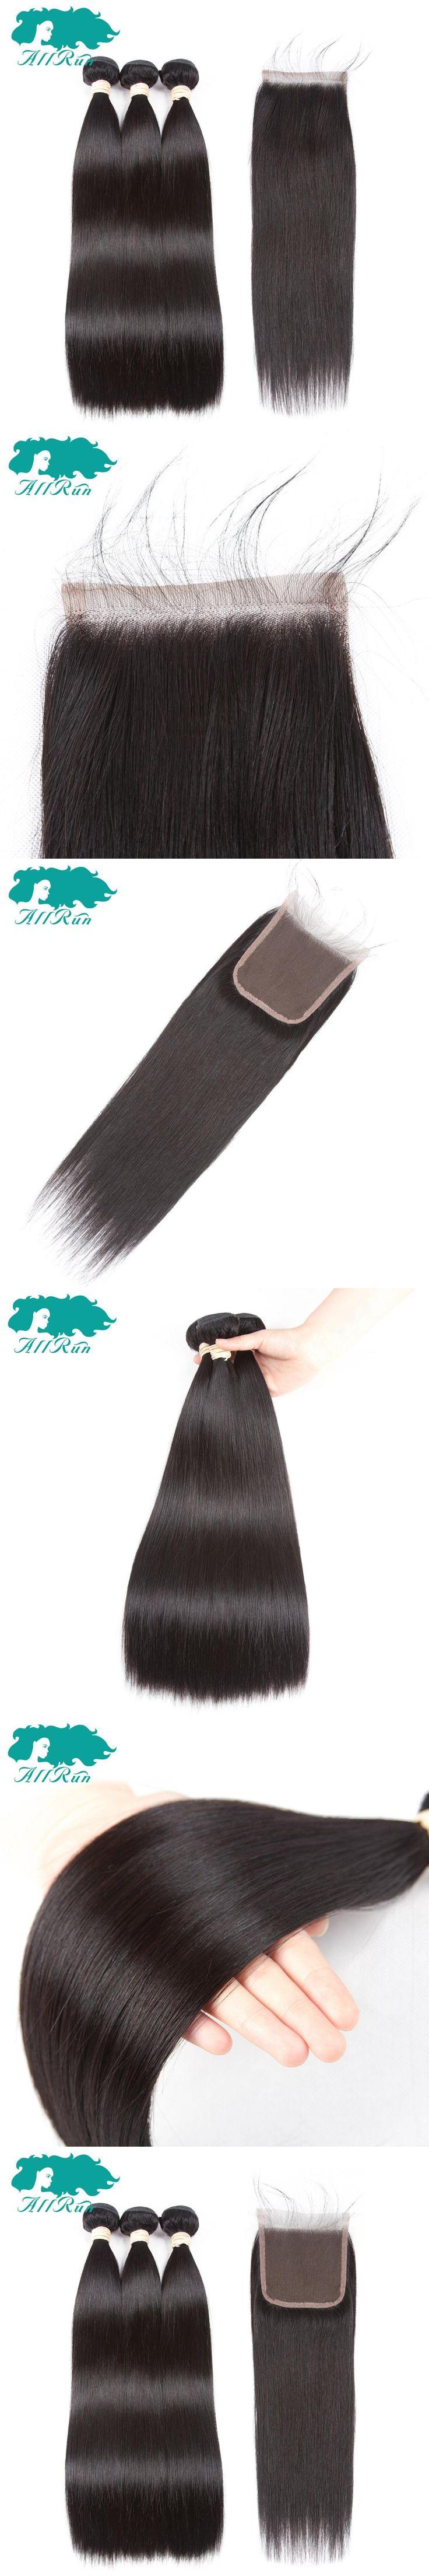 Allrun Pre-Colored Peruvian Straight Hair 2/3pcs With 4*4 Lace Closure 100% Human Hair Weave Soft Peruvian Hair Extensions